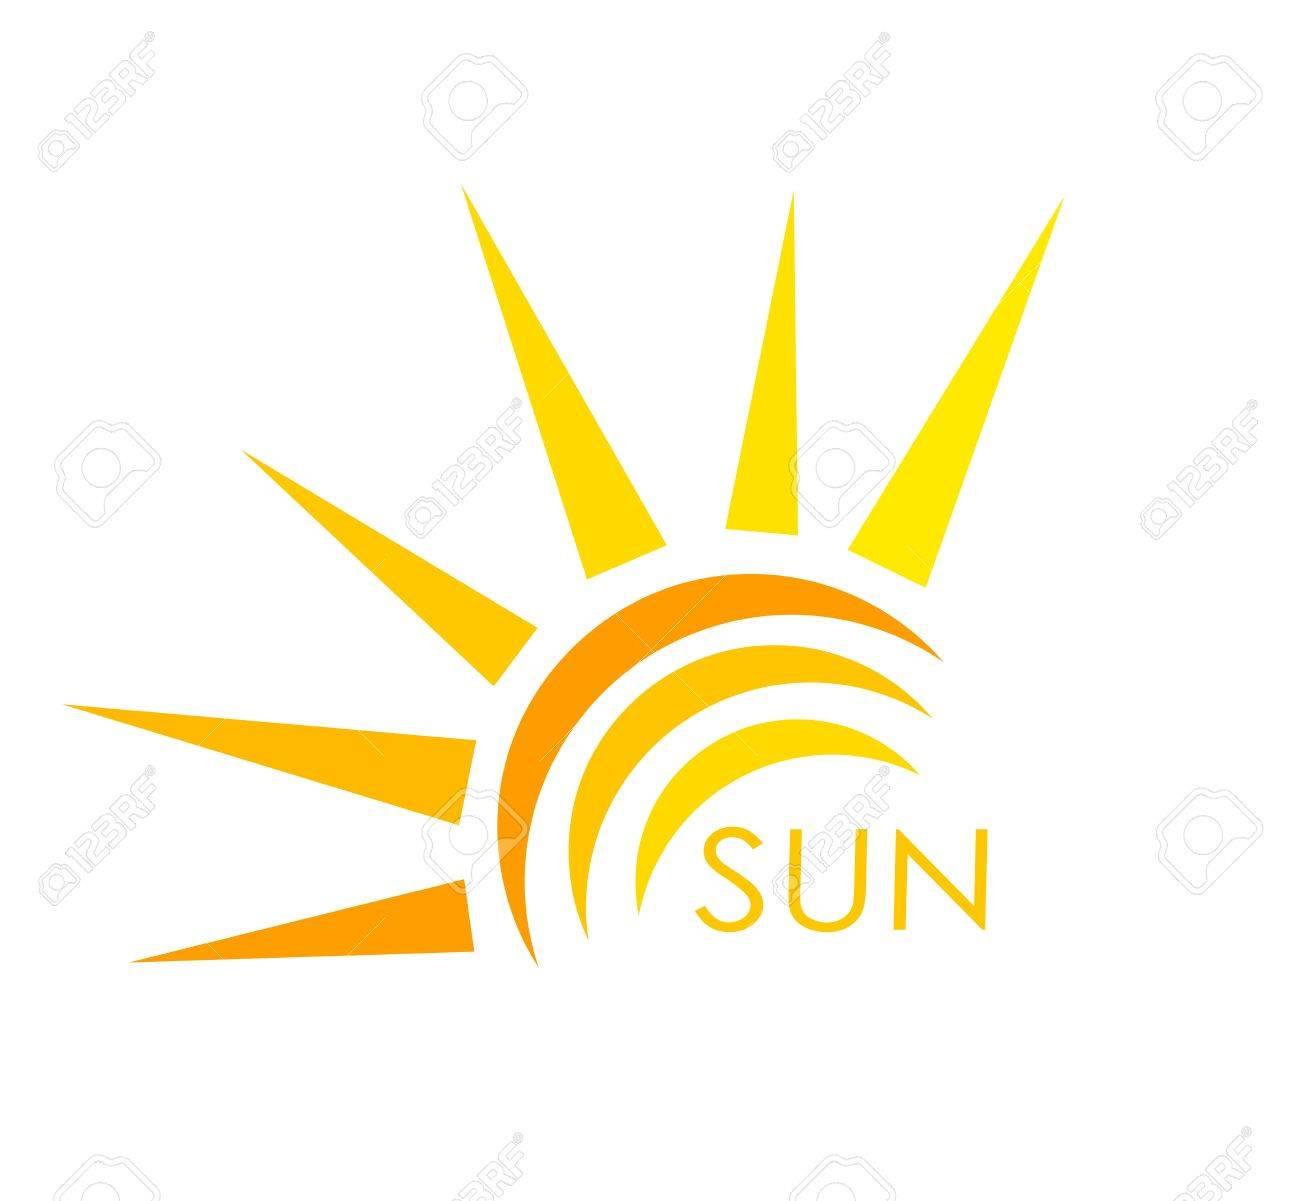 Sun symbol. Abstract vector illustration - 21947494